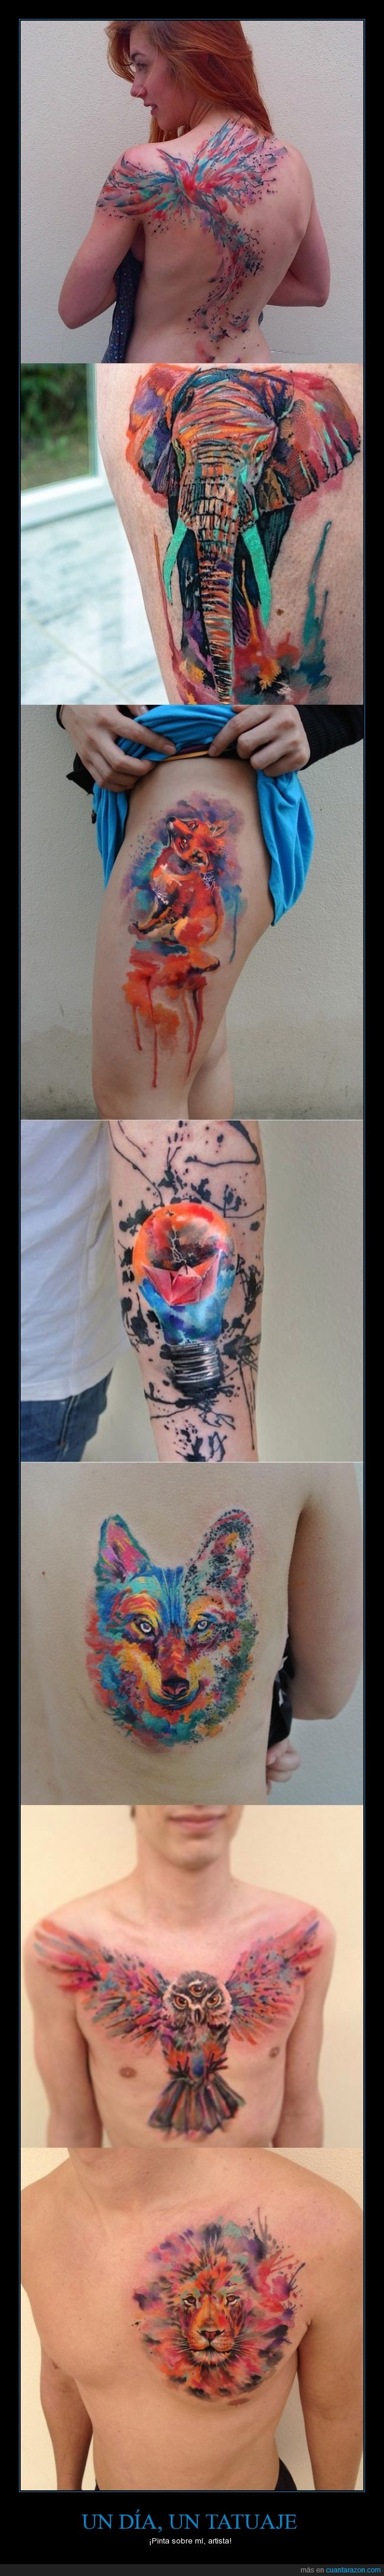 acuarela,artista,belleza,dibujo,pintura,tatuaje